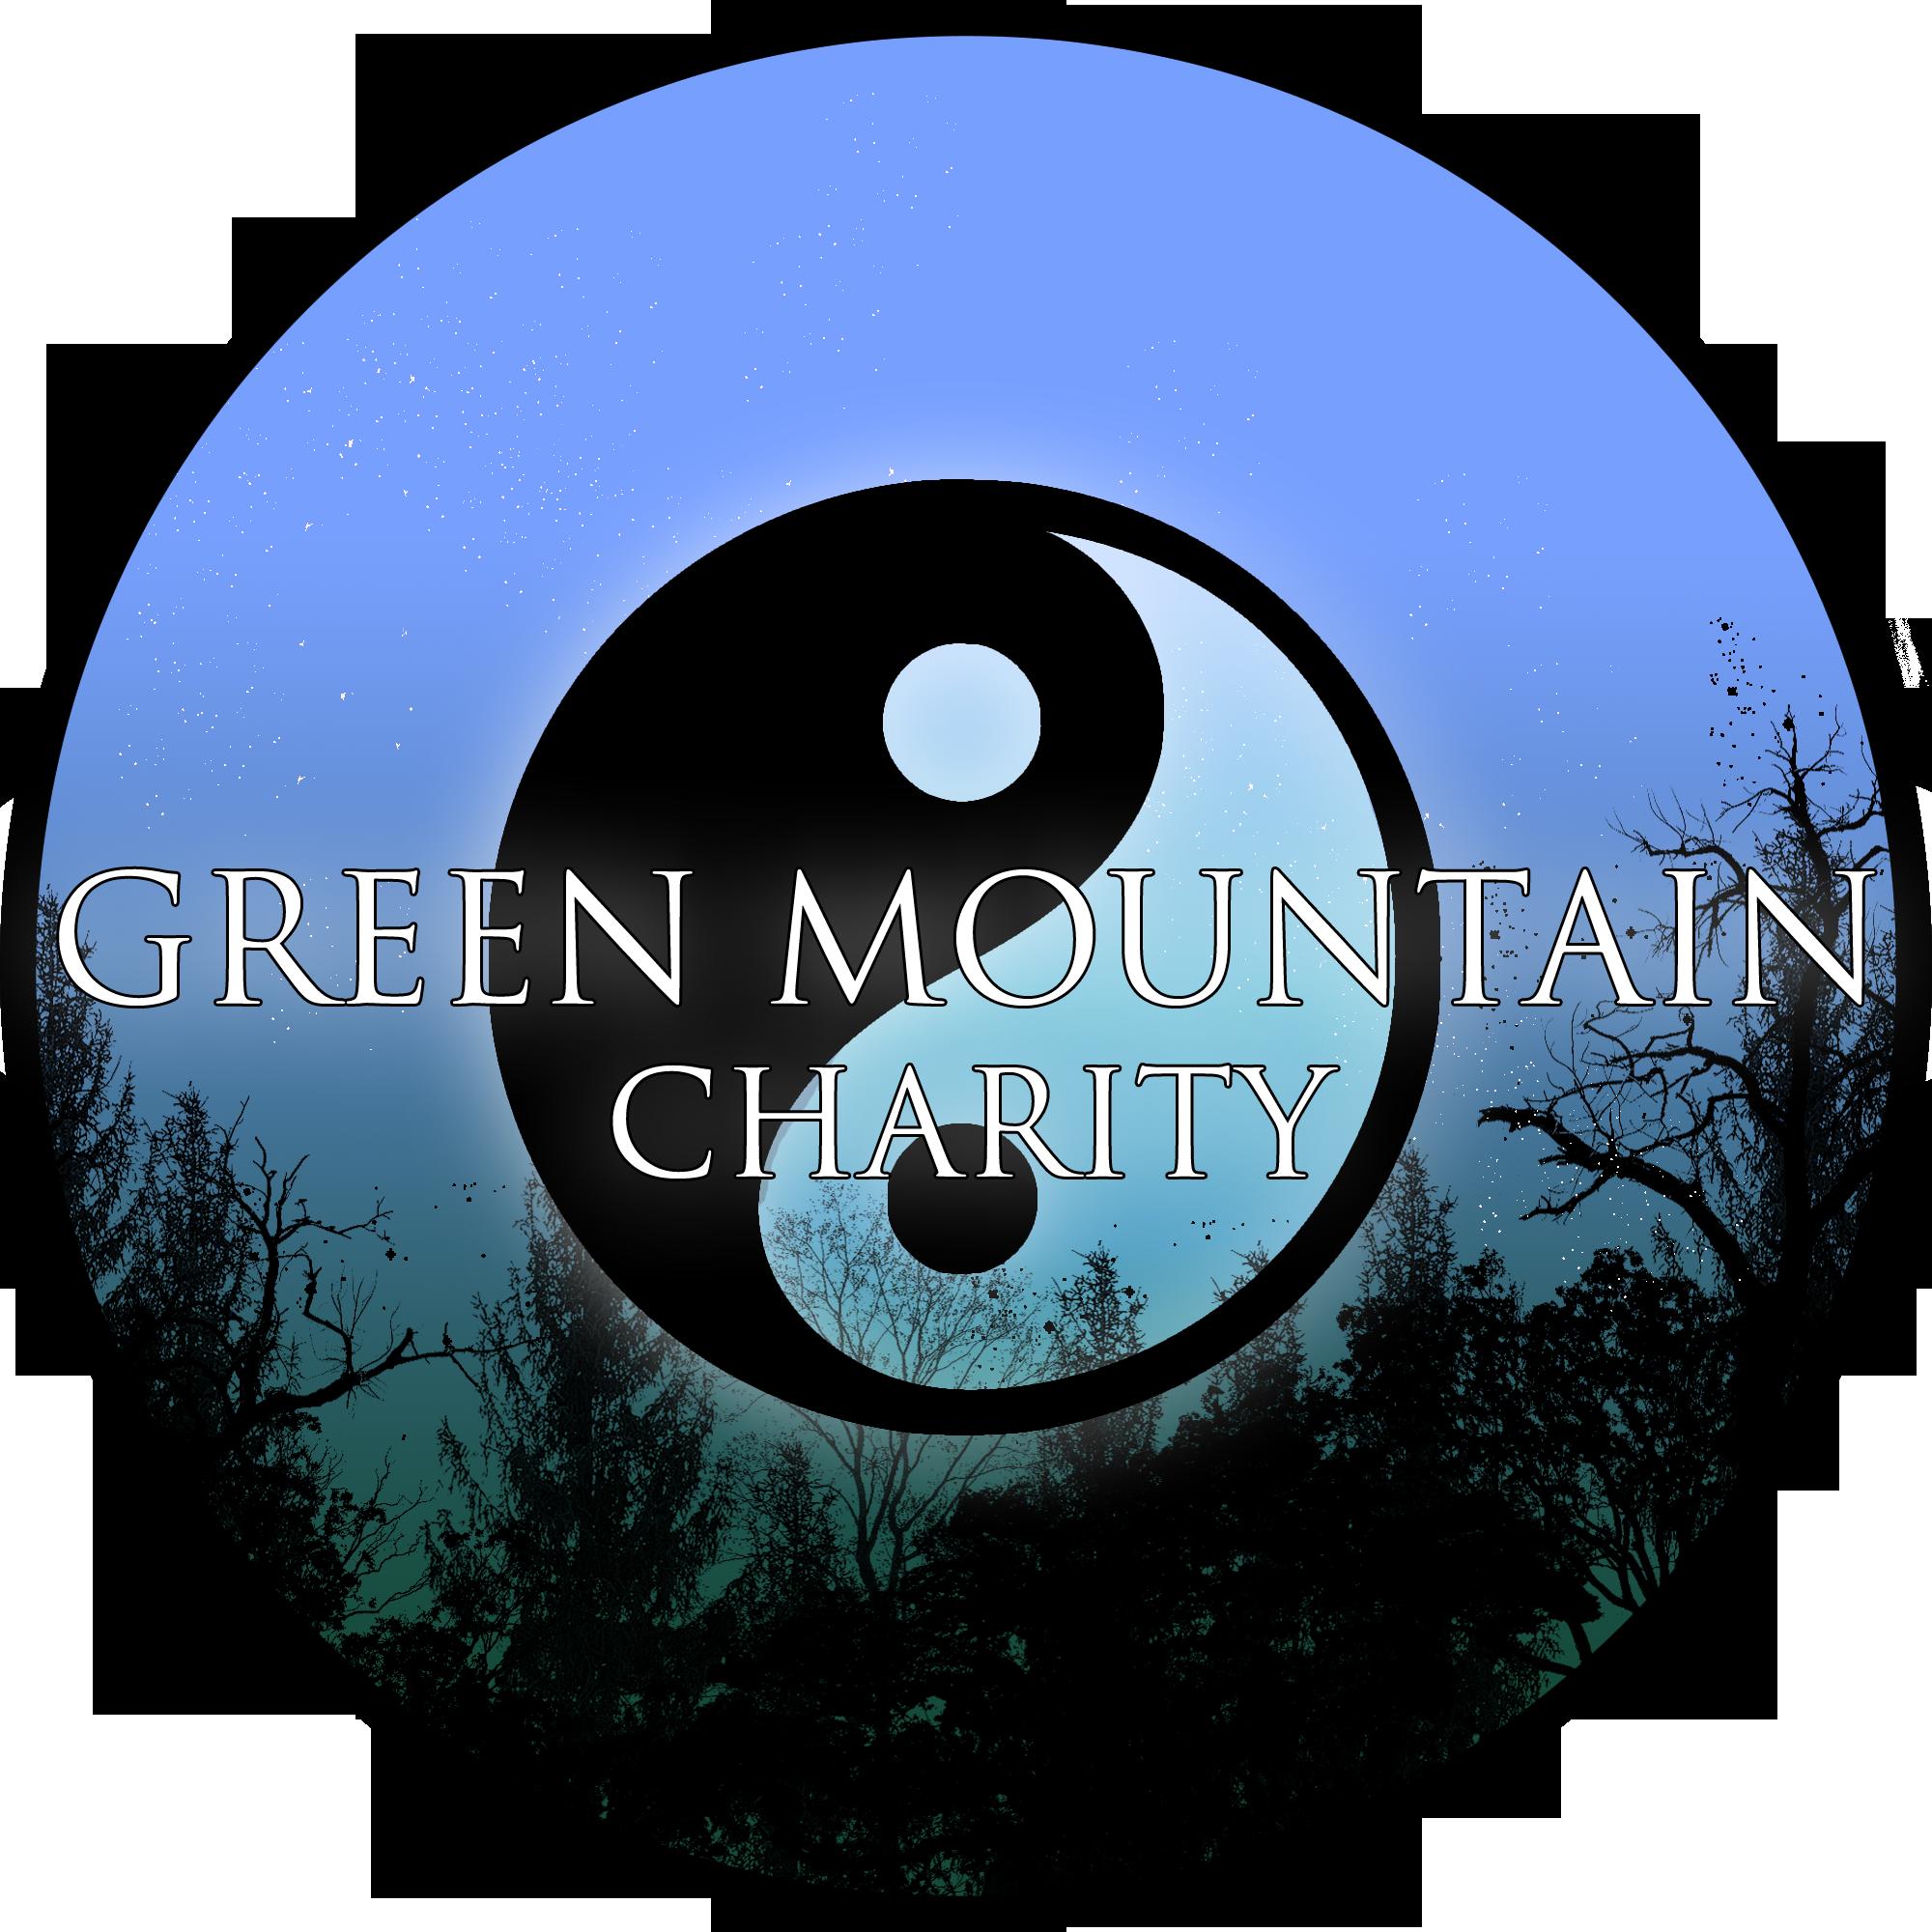 Green_Moutain_Logo_V3_.png.fbba19f0885bb5aea3d66318b5326b69.png